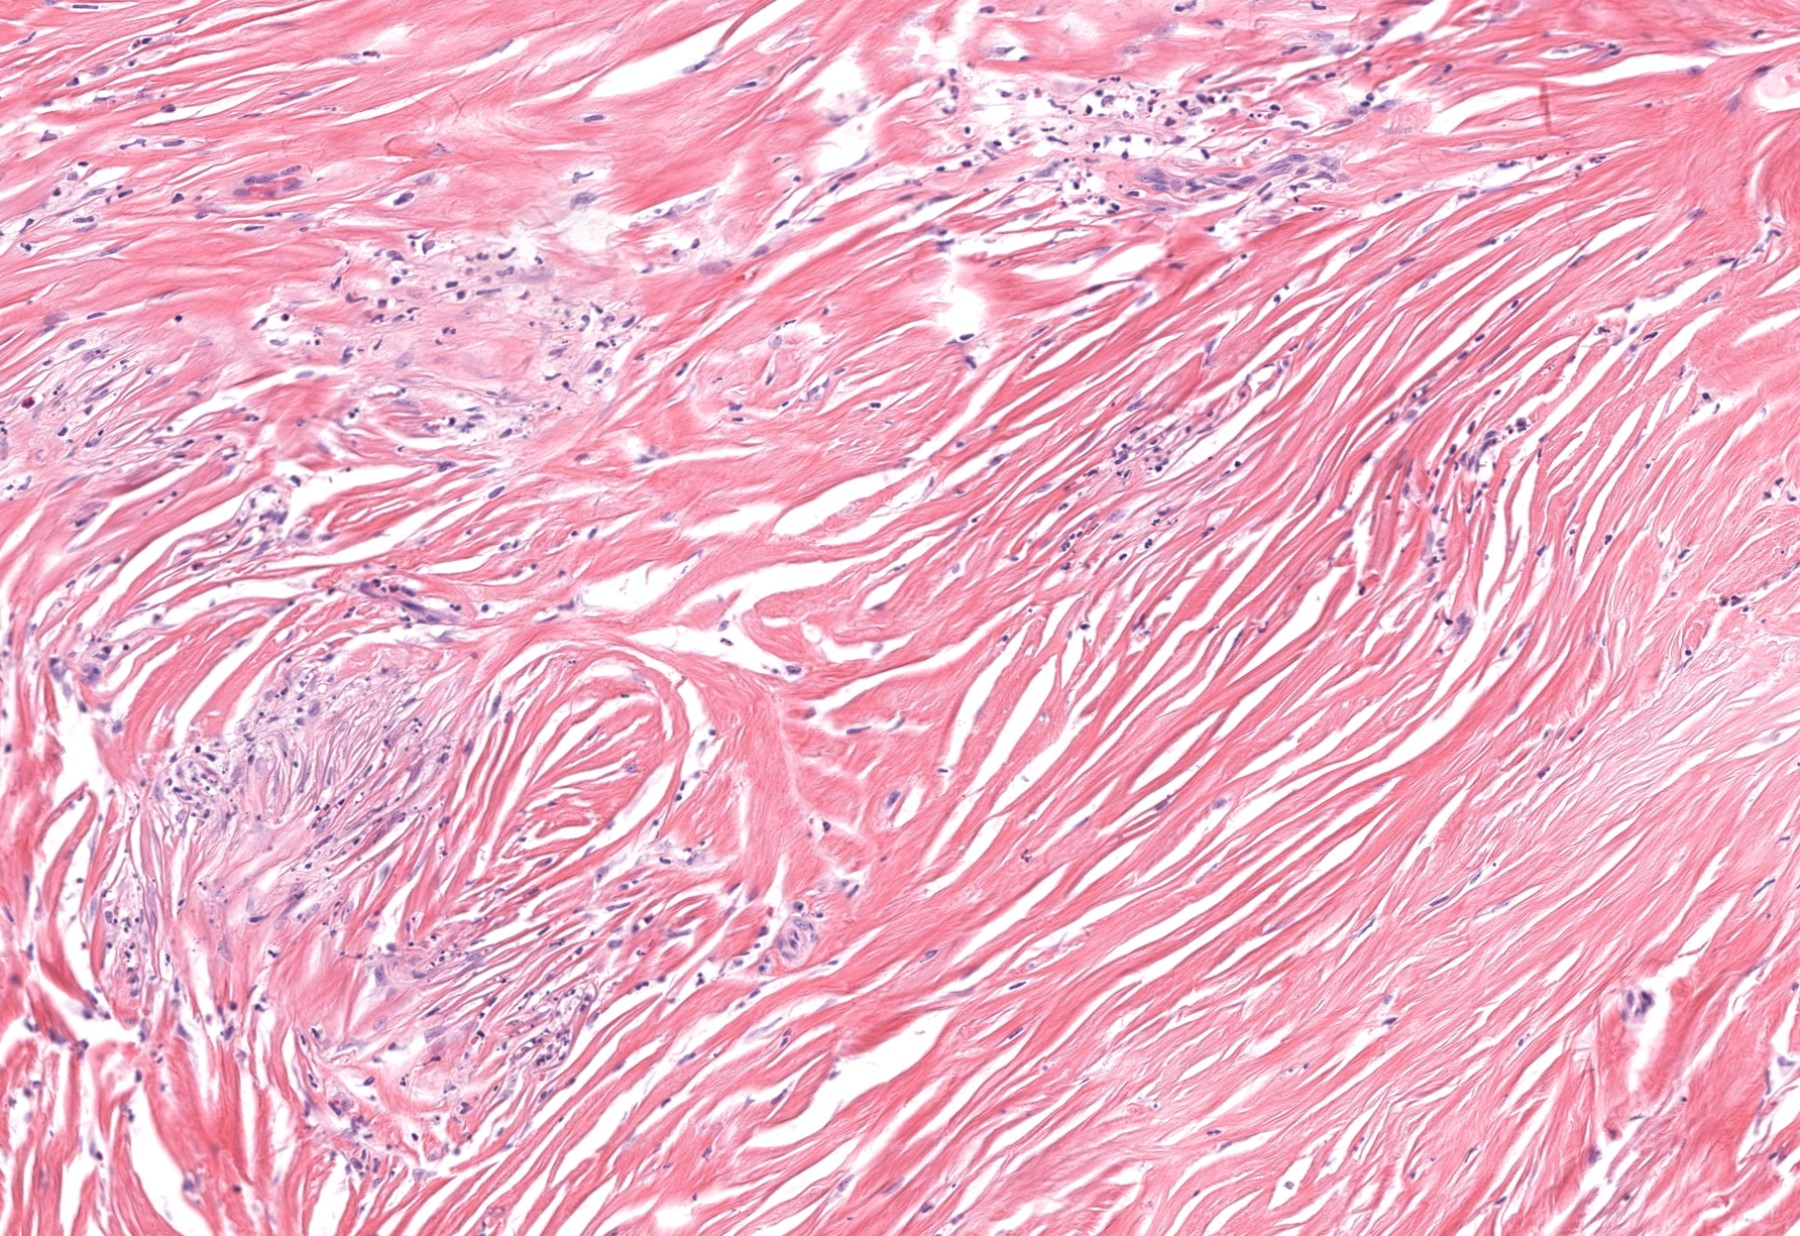 Storiform fibrosis